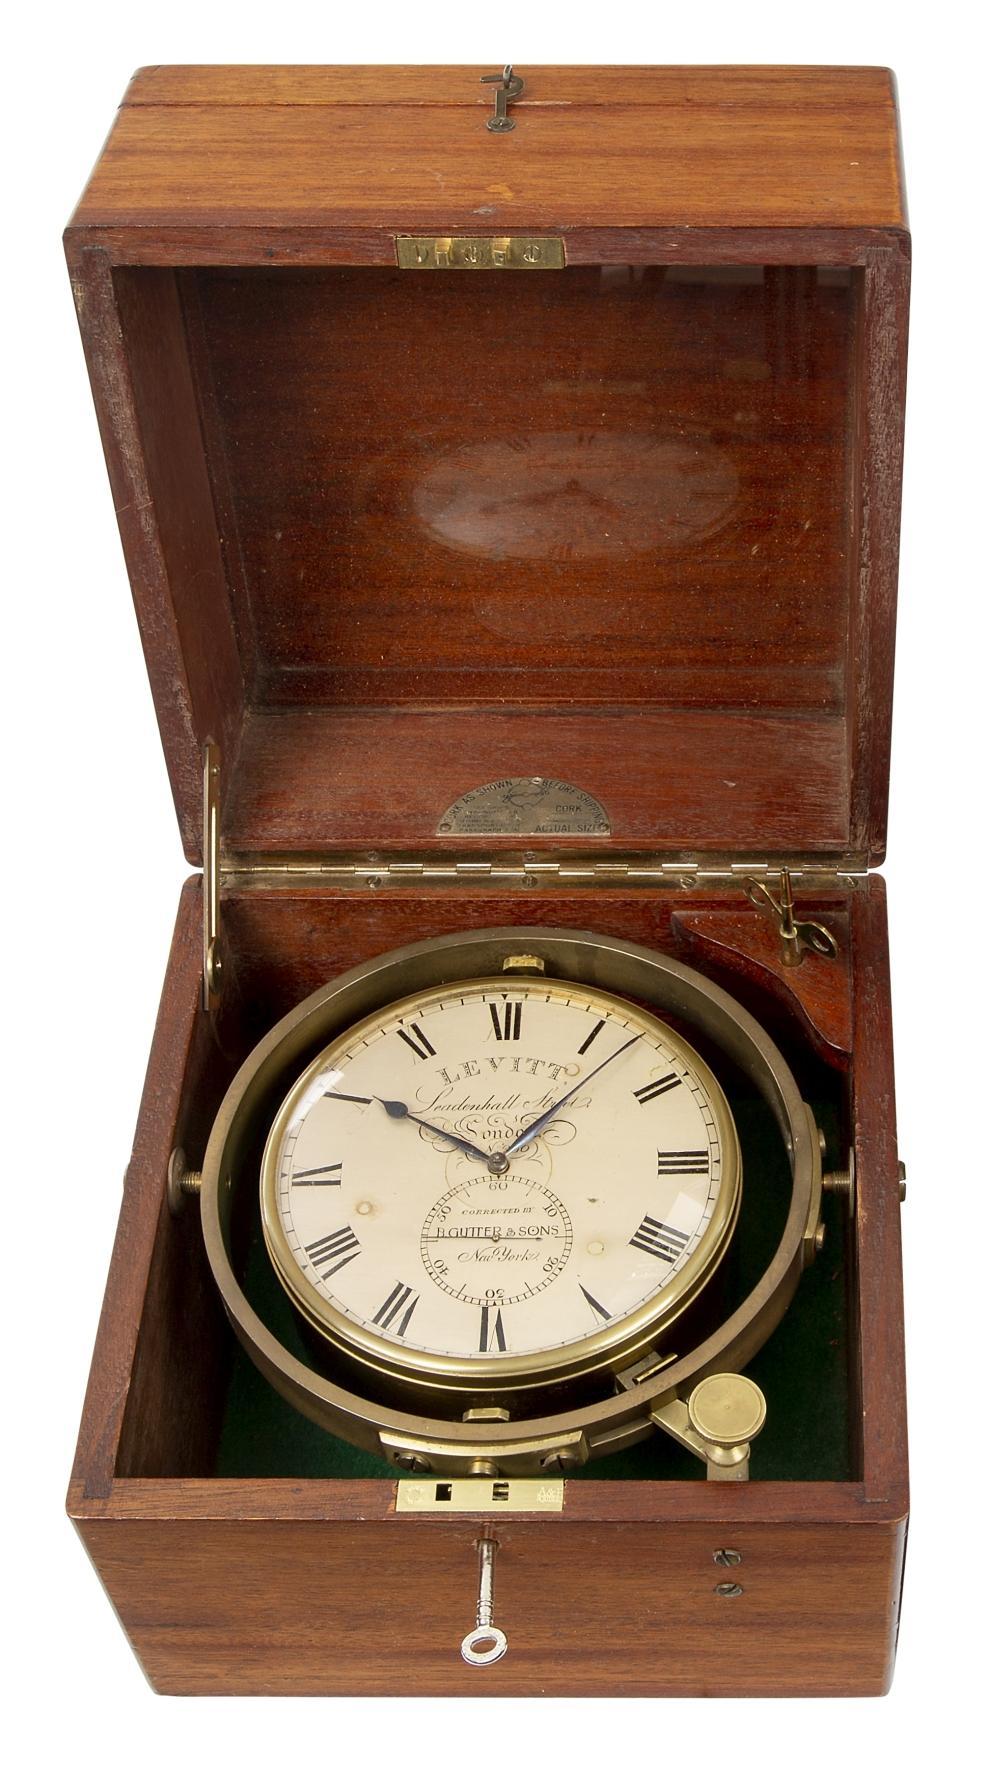 AN EIGHT-DAY MARINE CHRONOMETER BY LEVITT, LONDON, RETAILED BY B. GUTTER & SONS, NEW YORK CIRCA 1830